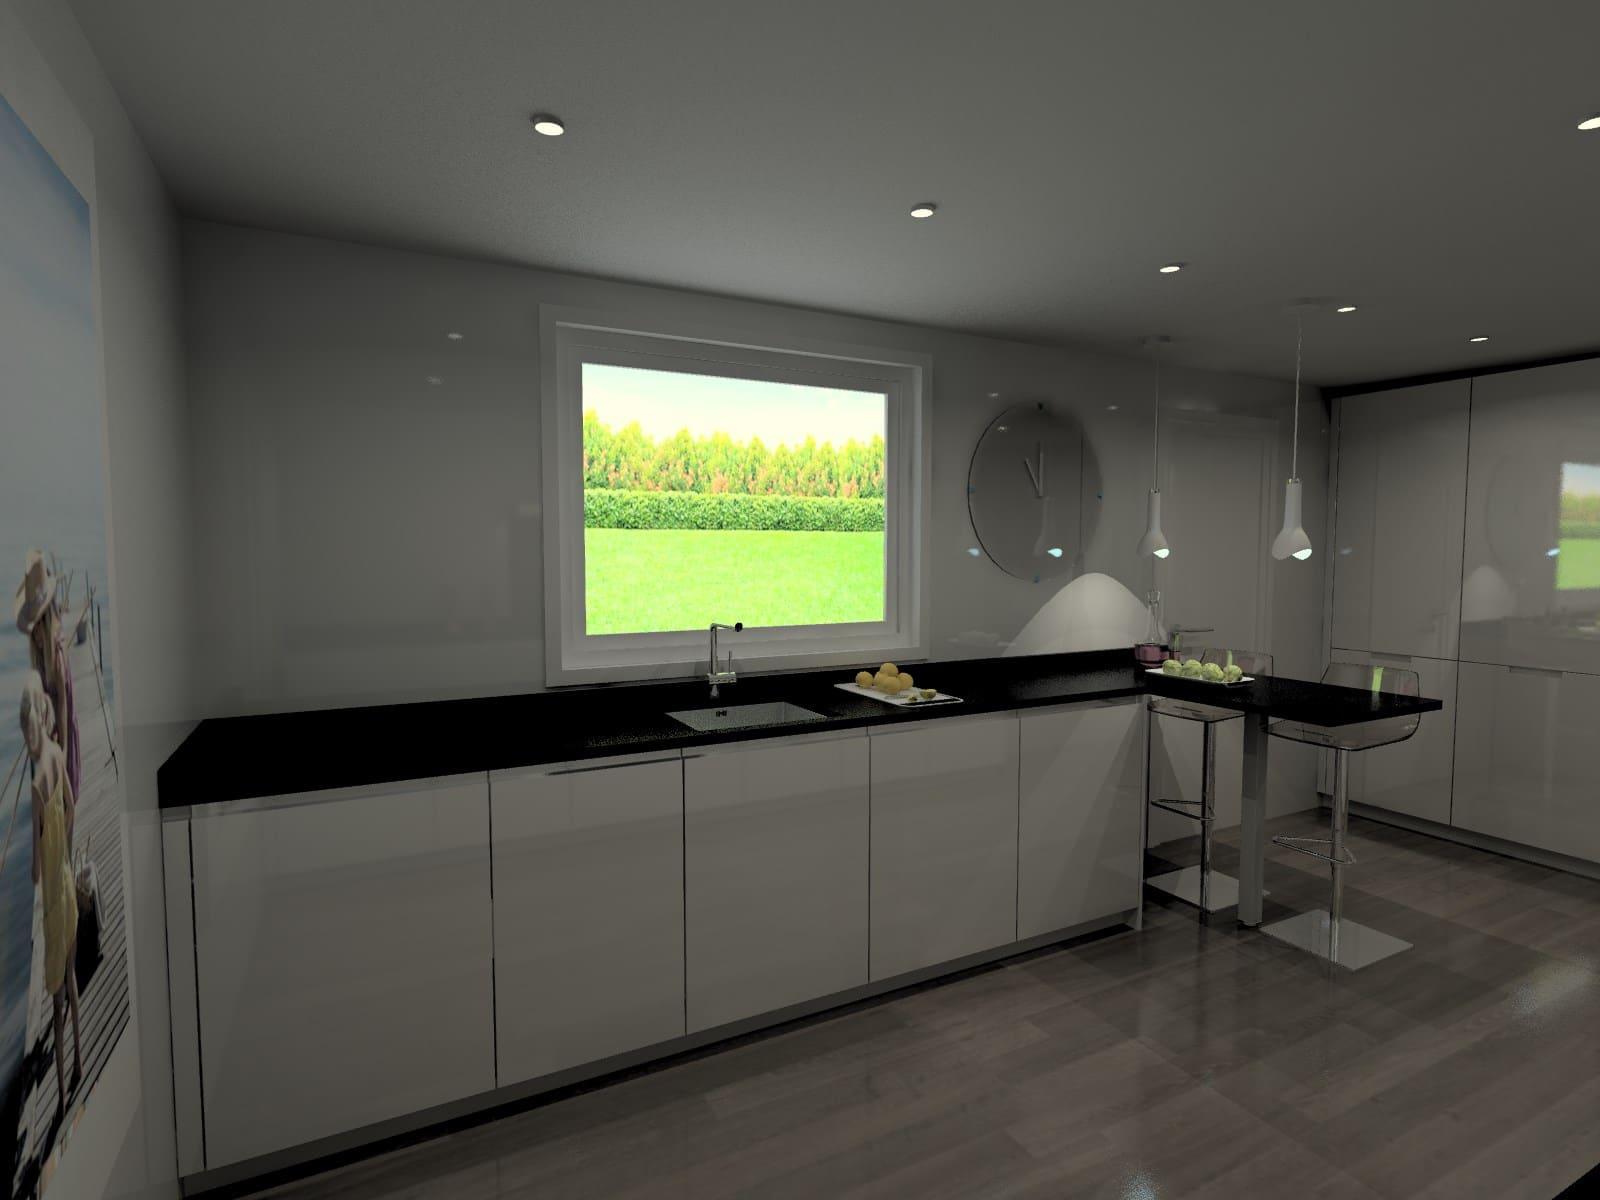 Oferta muebles de cocina artycocina for Easy ofertas muebles de cocina